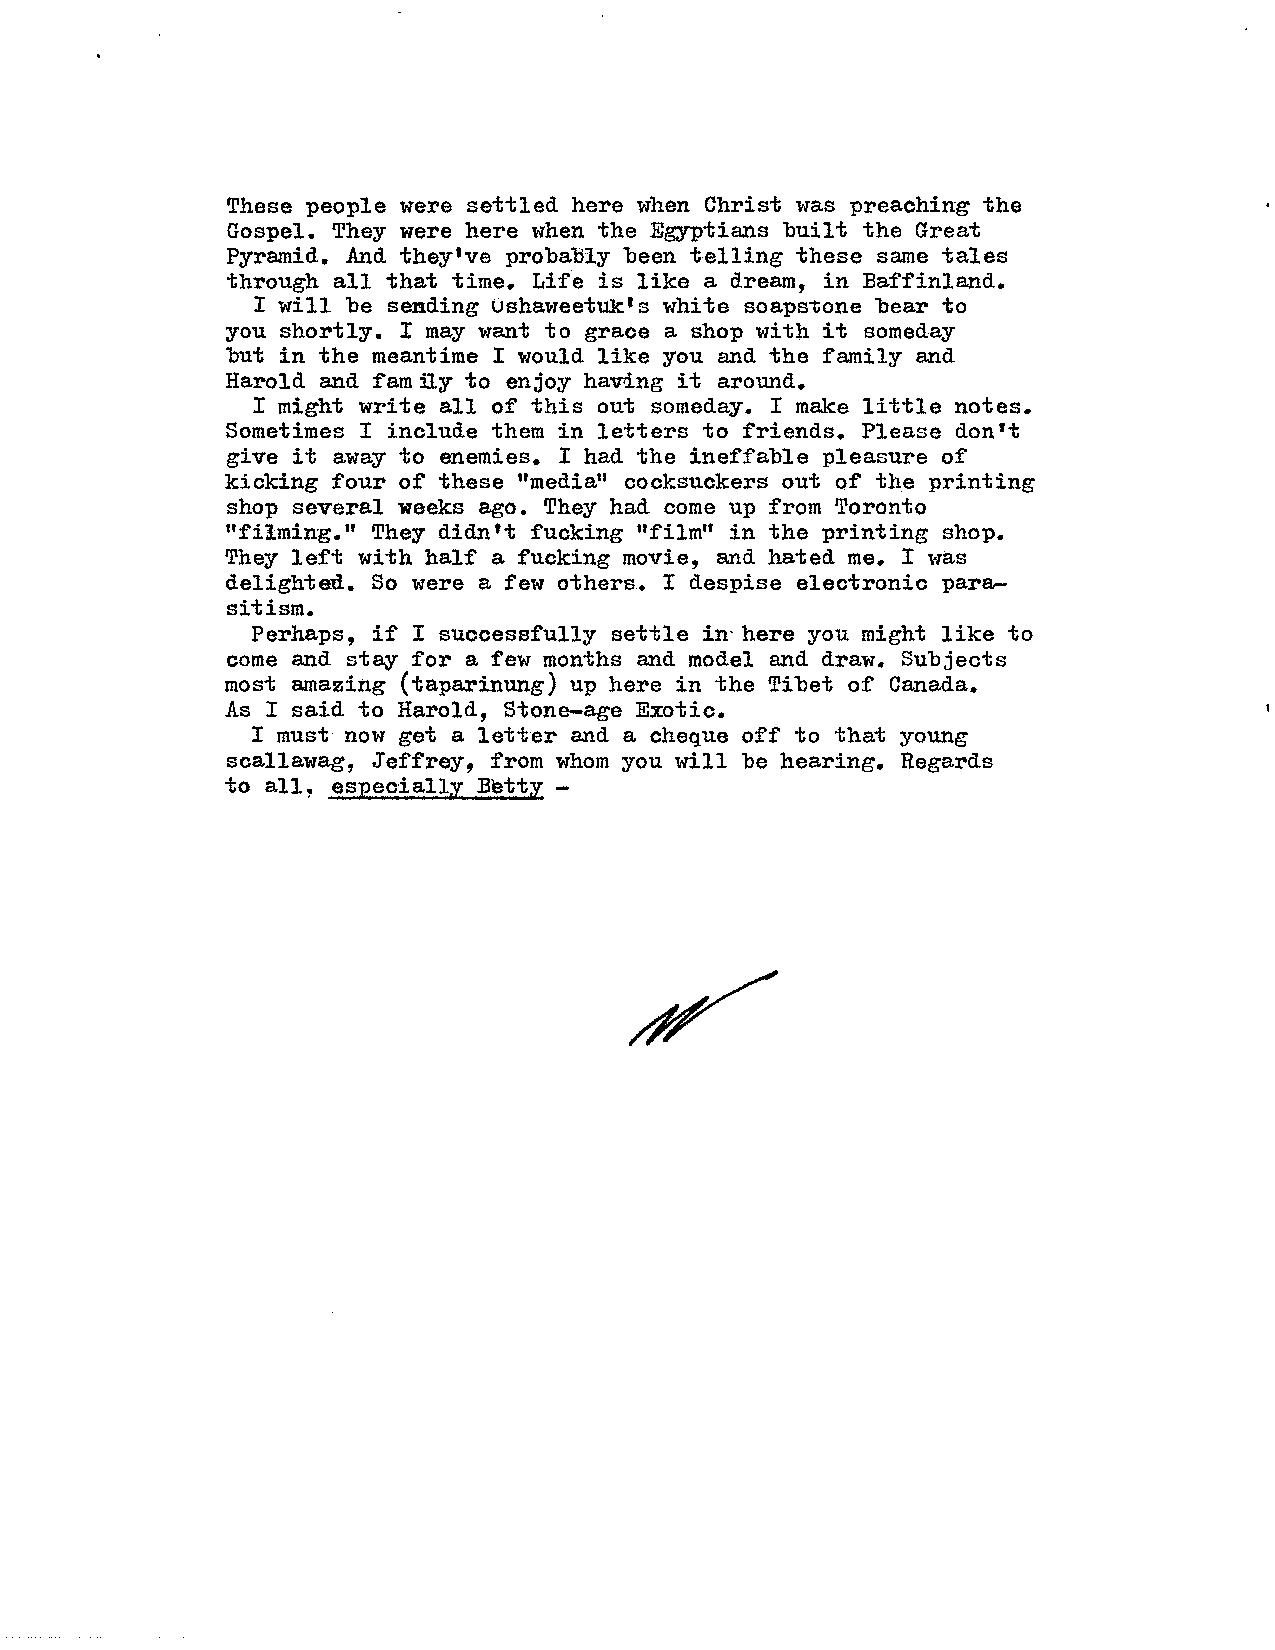 March201974c.jpg